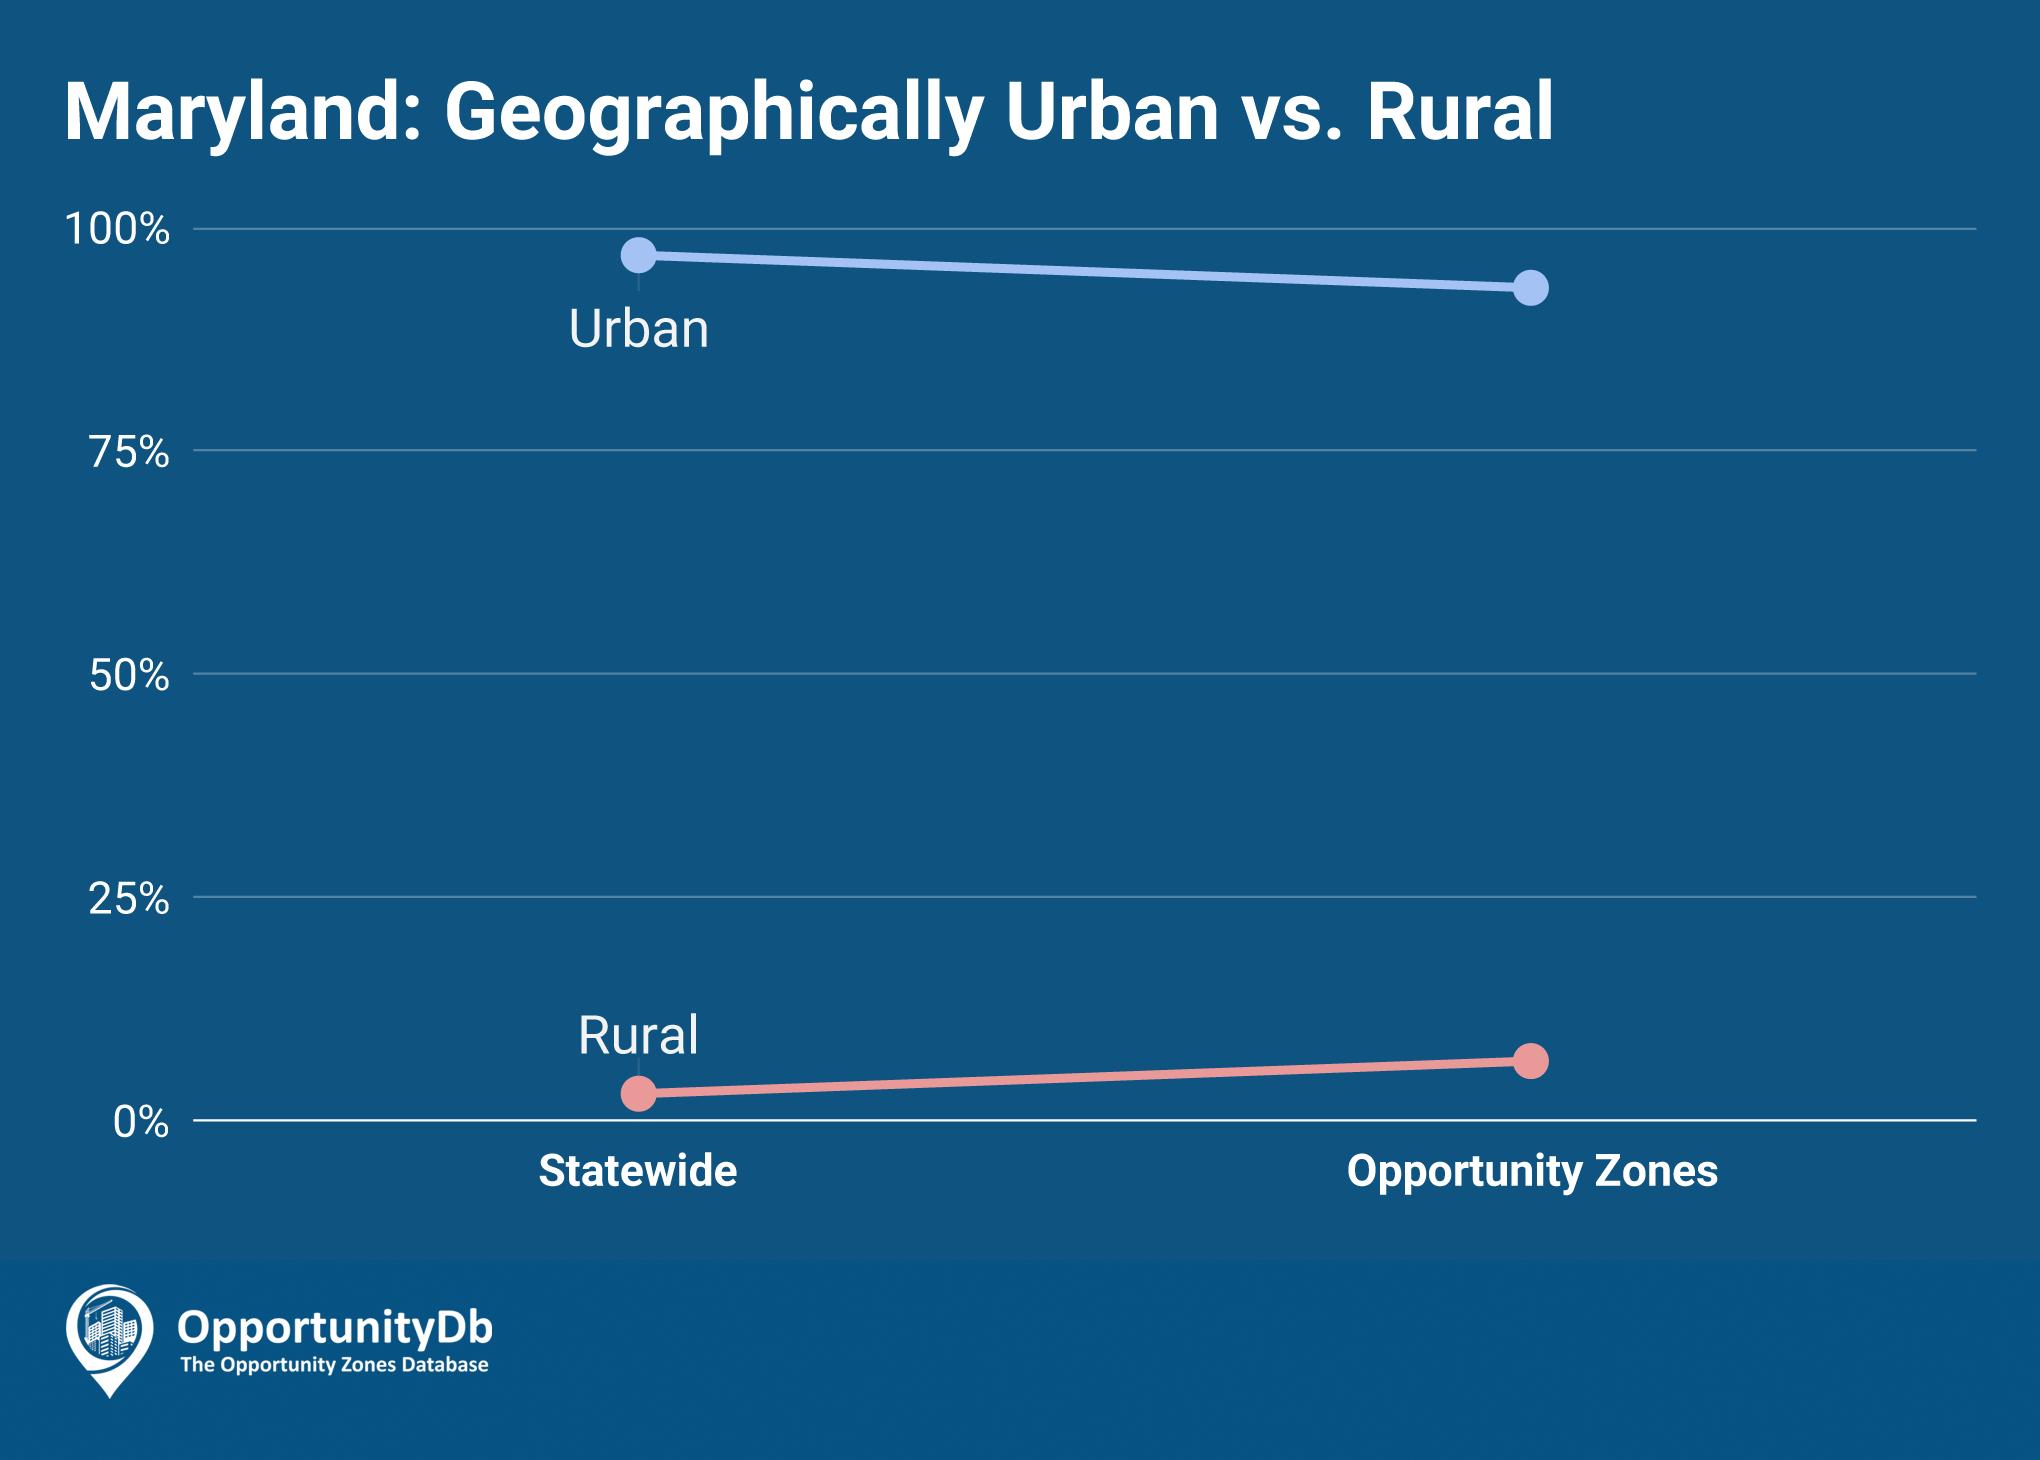 Urban vs. Rural in Maryland Opportunity Zones